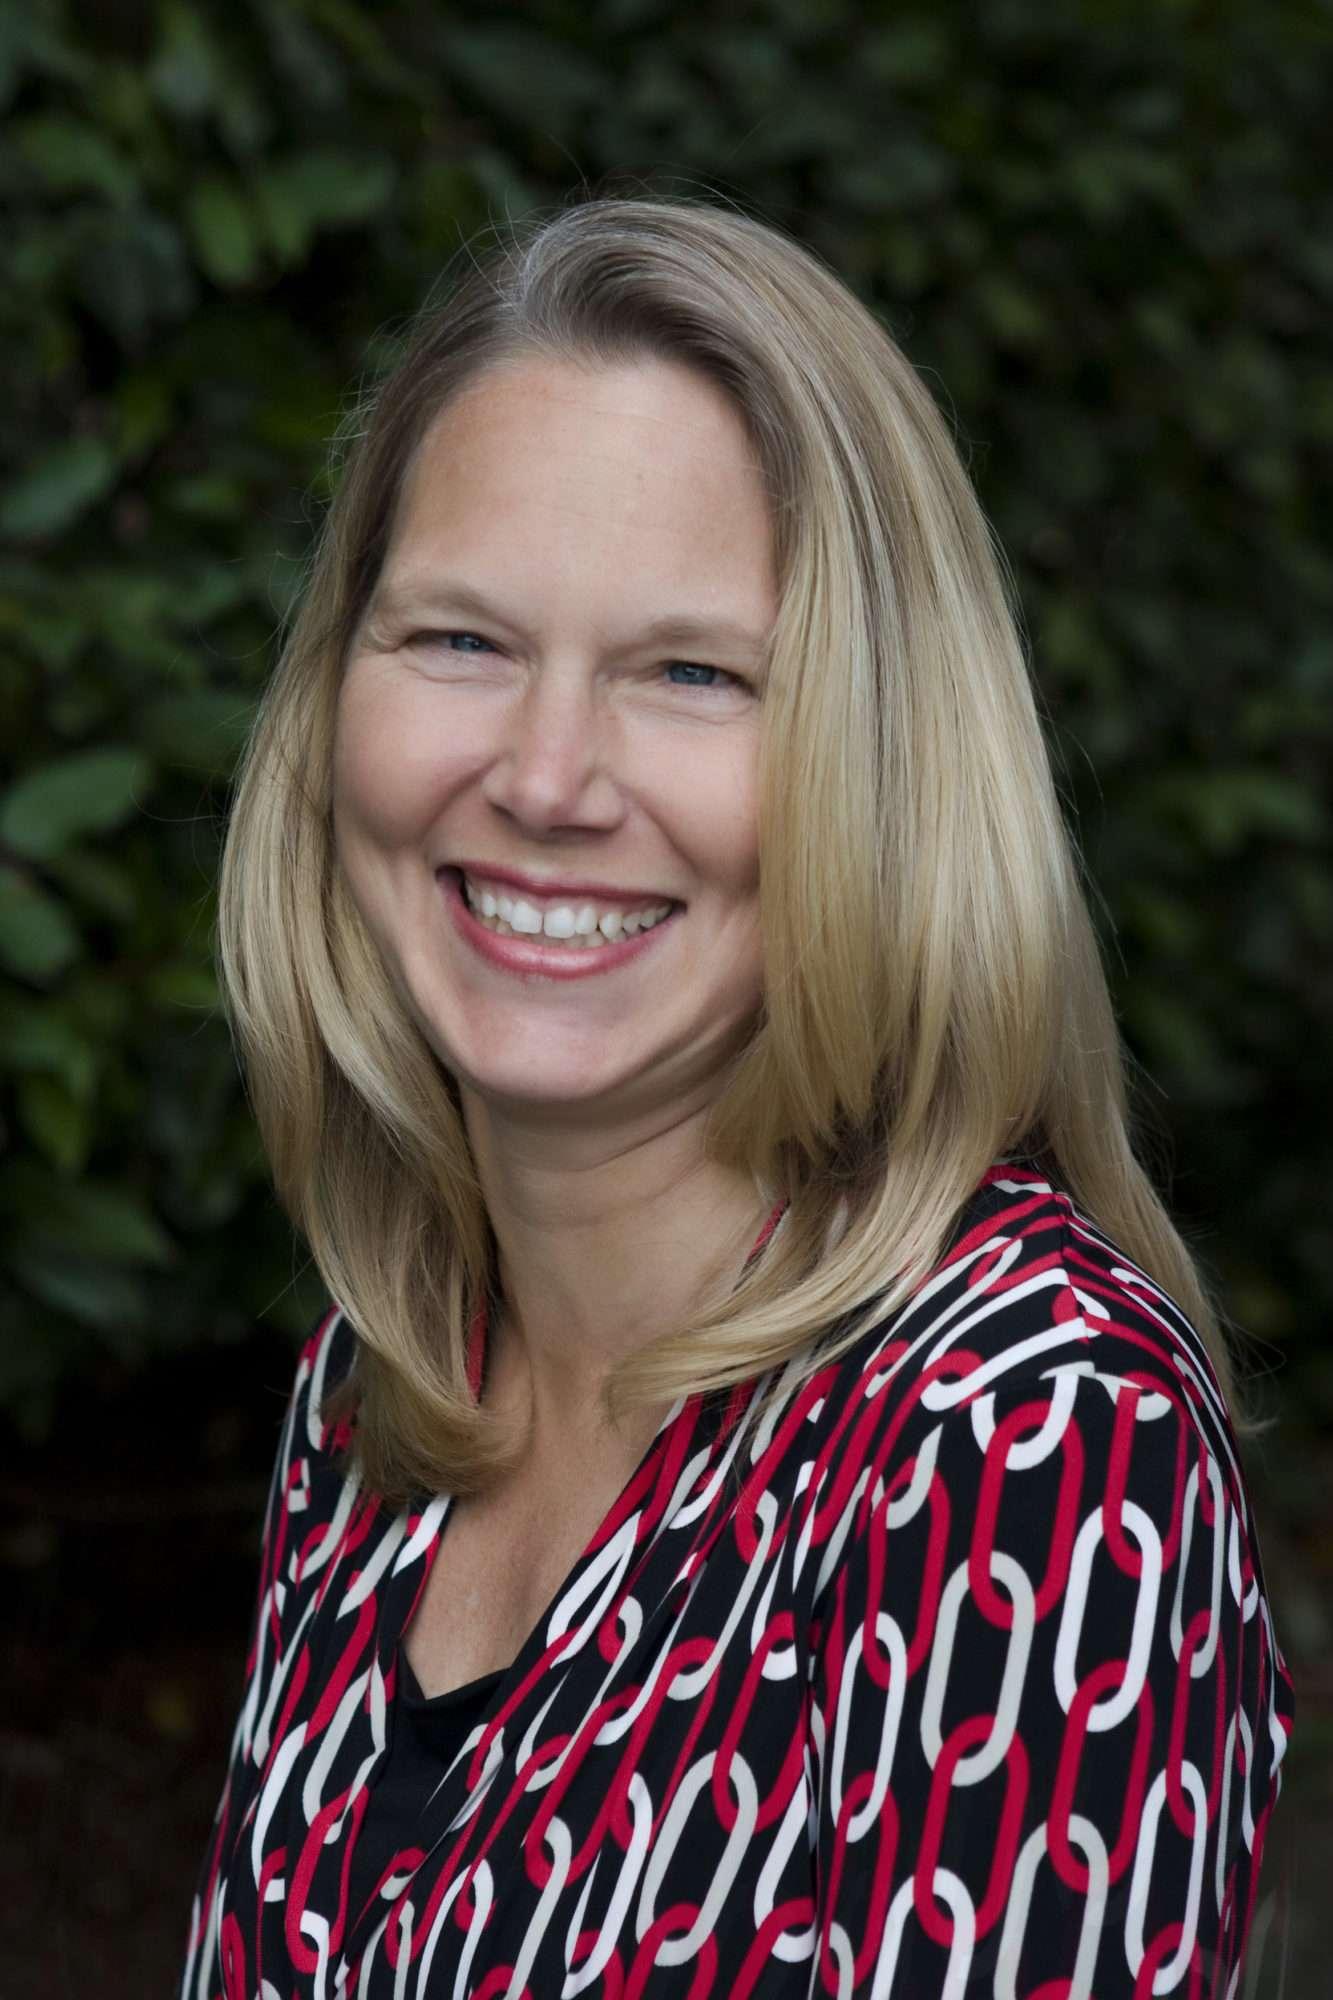 Profile picture of Lile moving company VP of Finance Vanessa Rimby